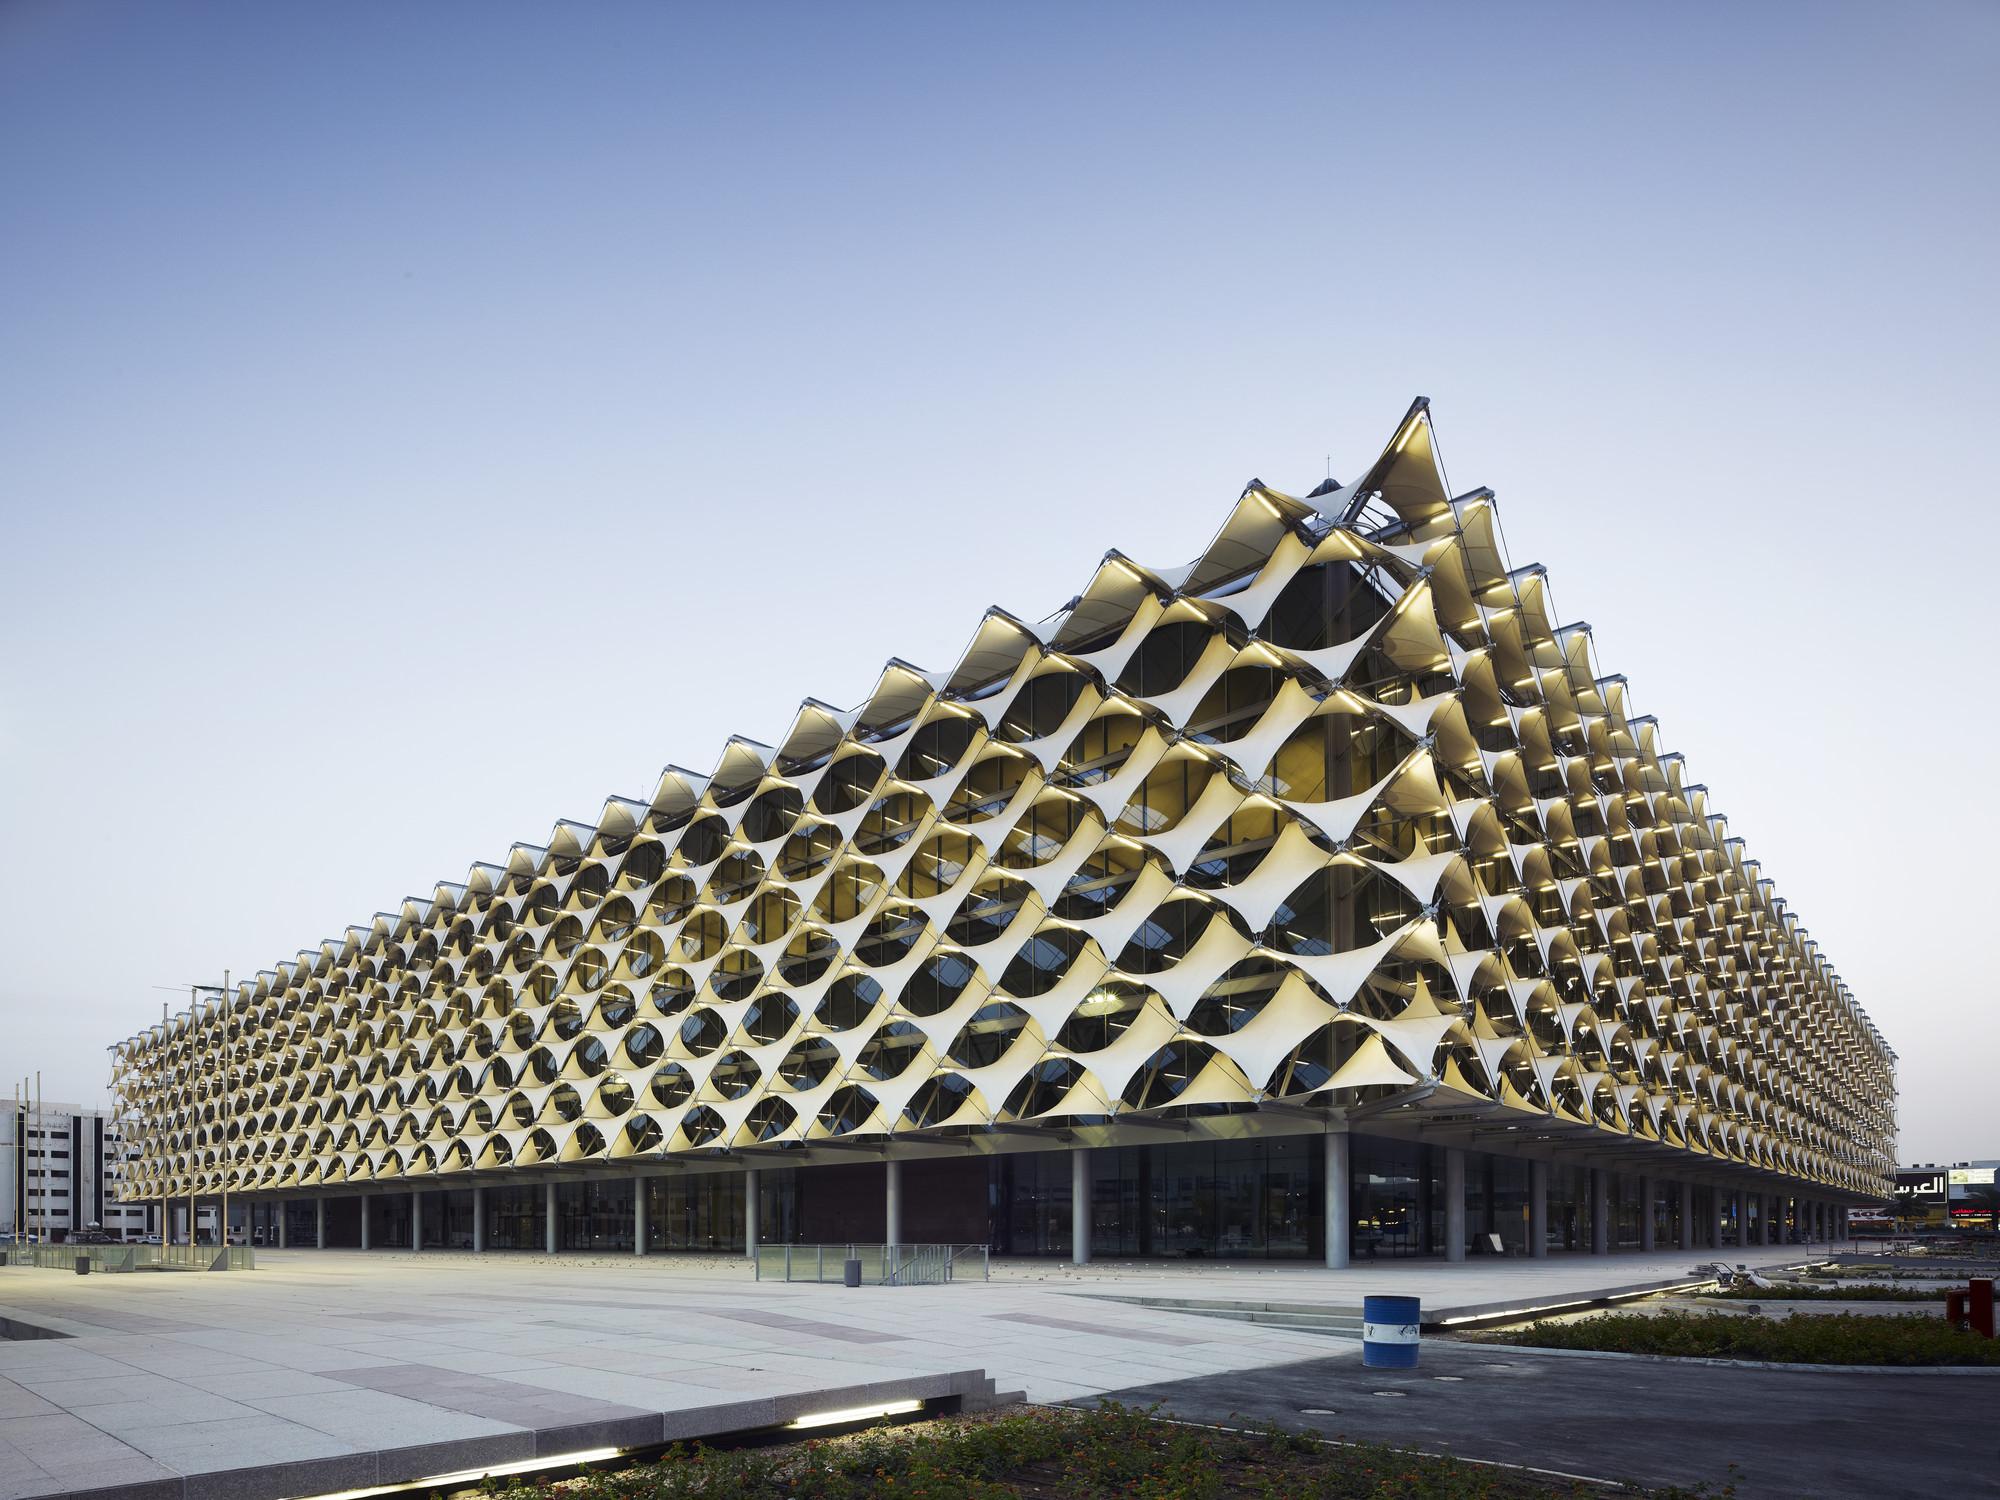 King Fahad National Library / Gerber Architekten, © Christian Richters